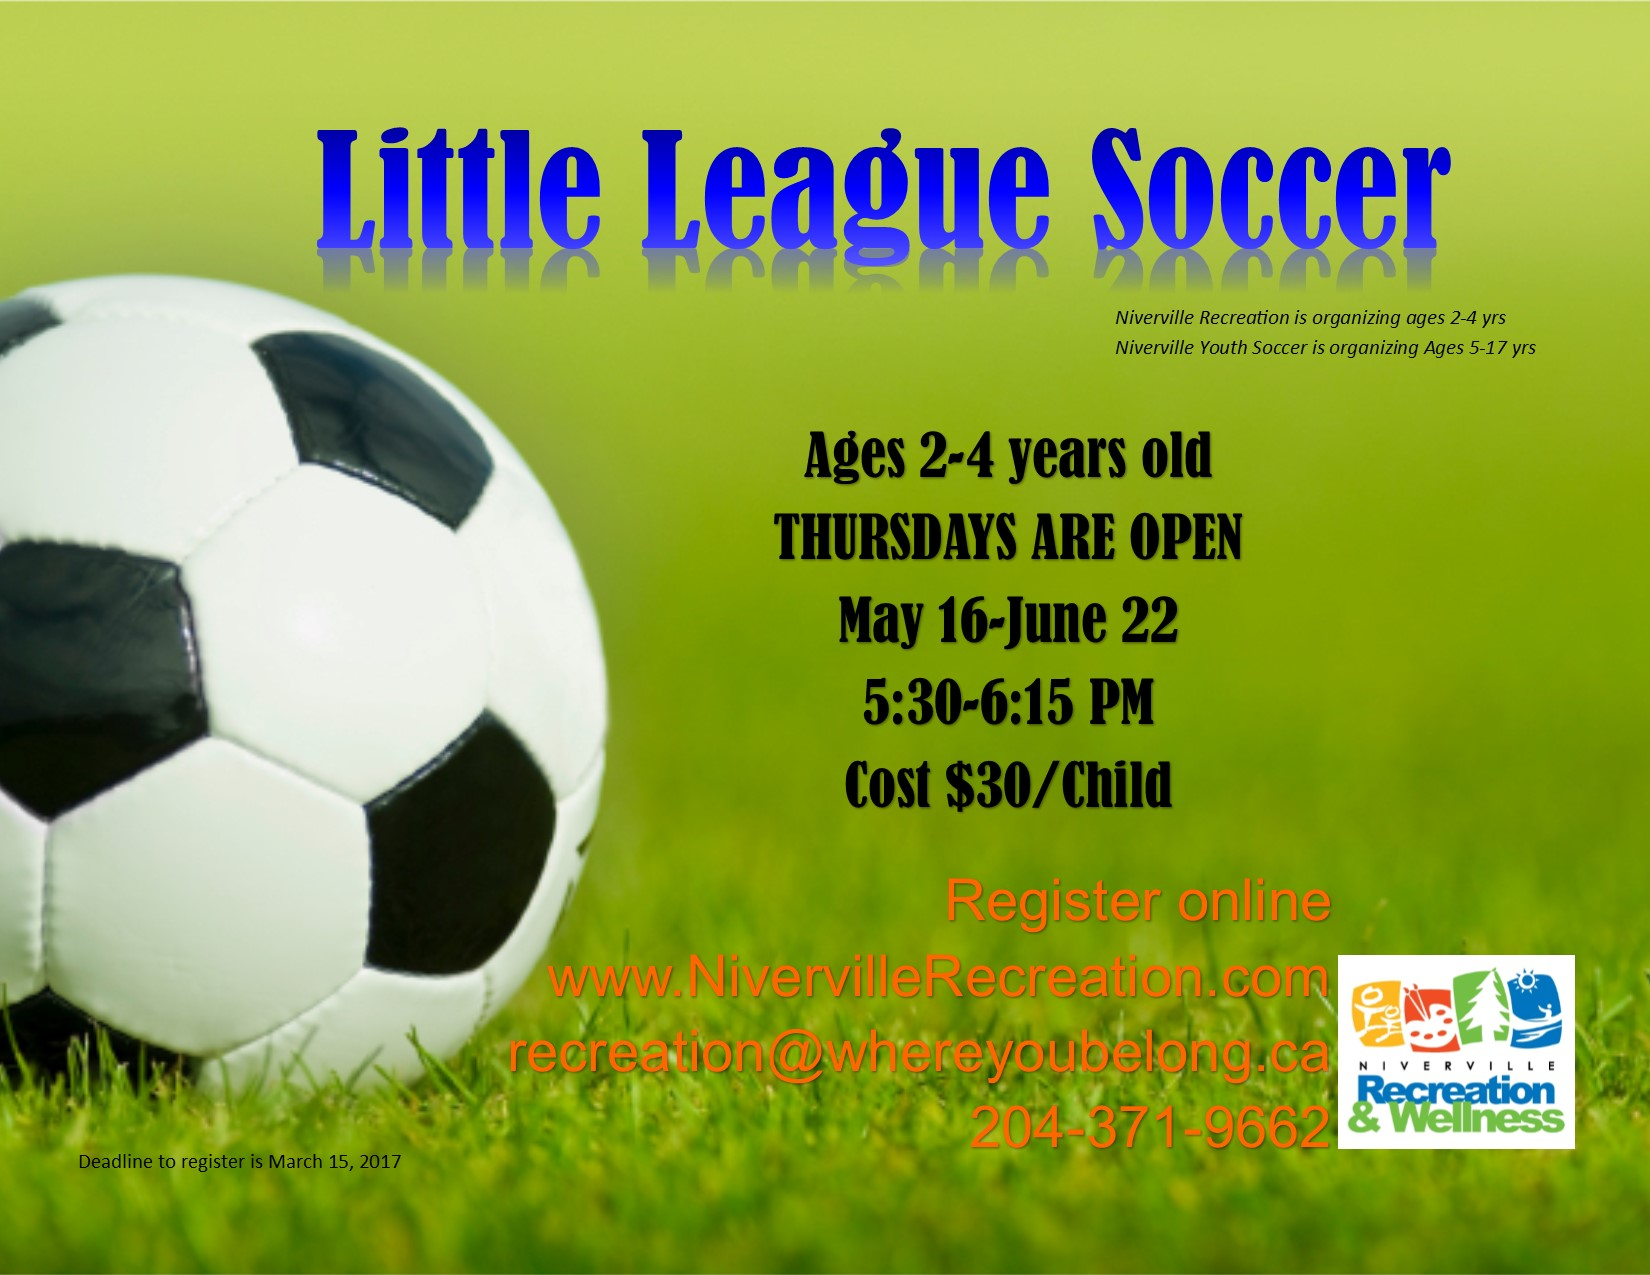 Little League Poster for Thursdays Nights